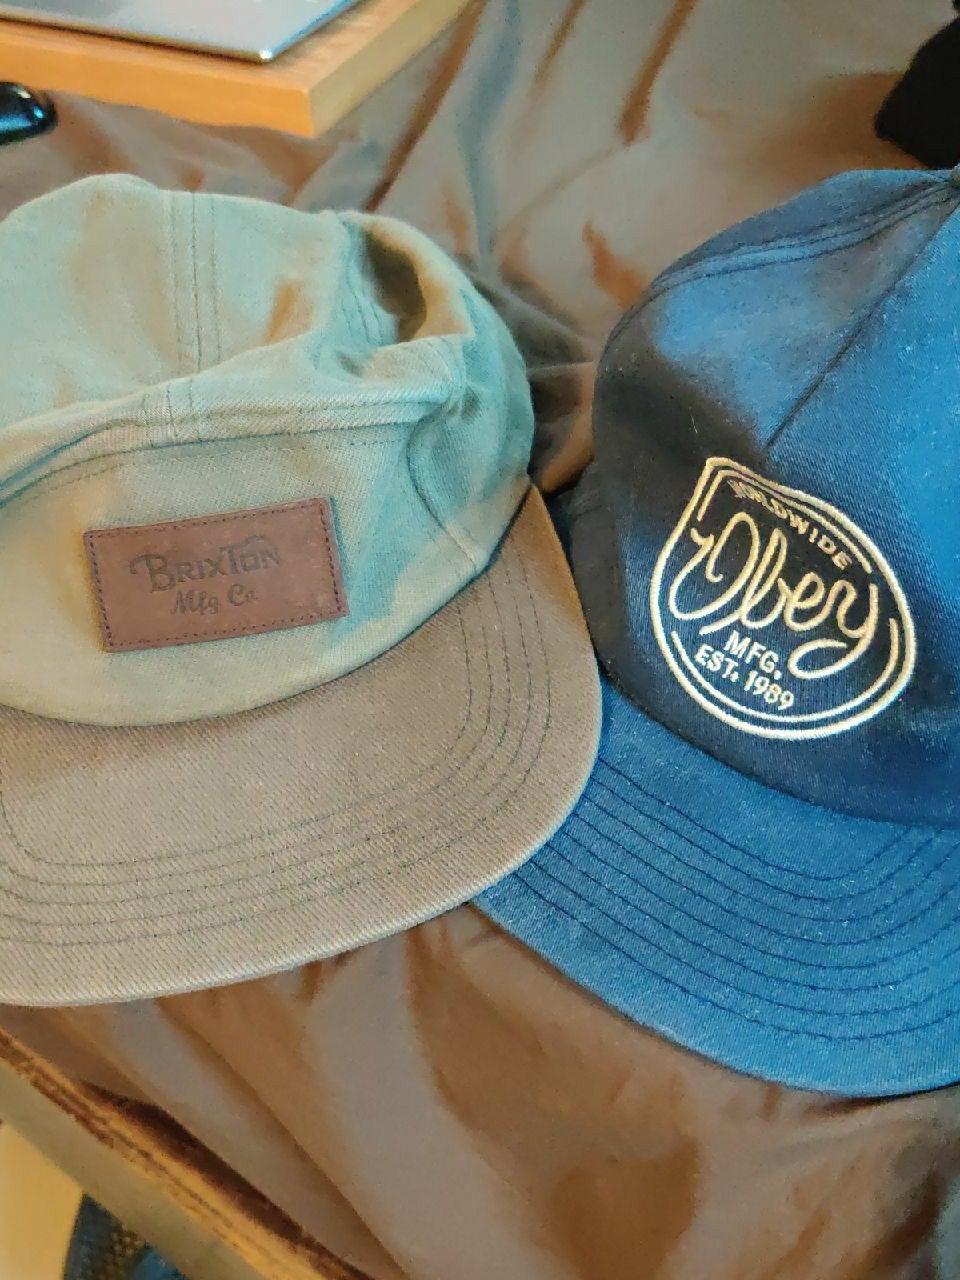 Brixton / Obey hats